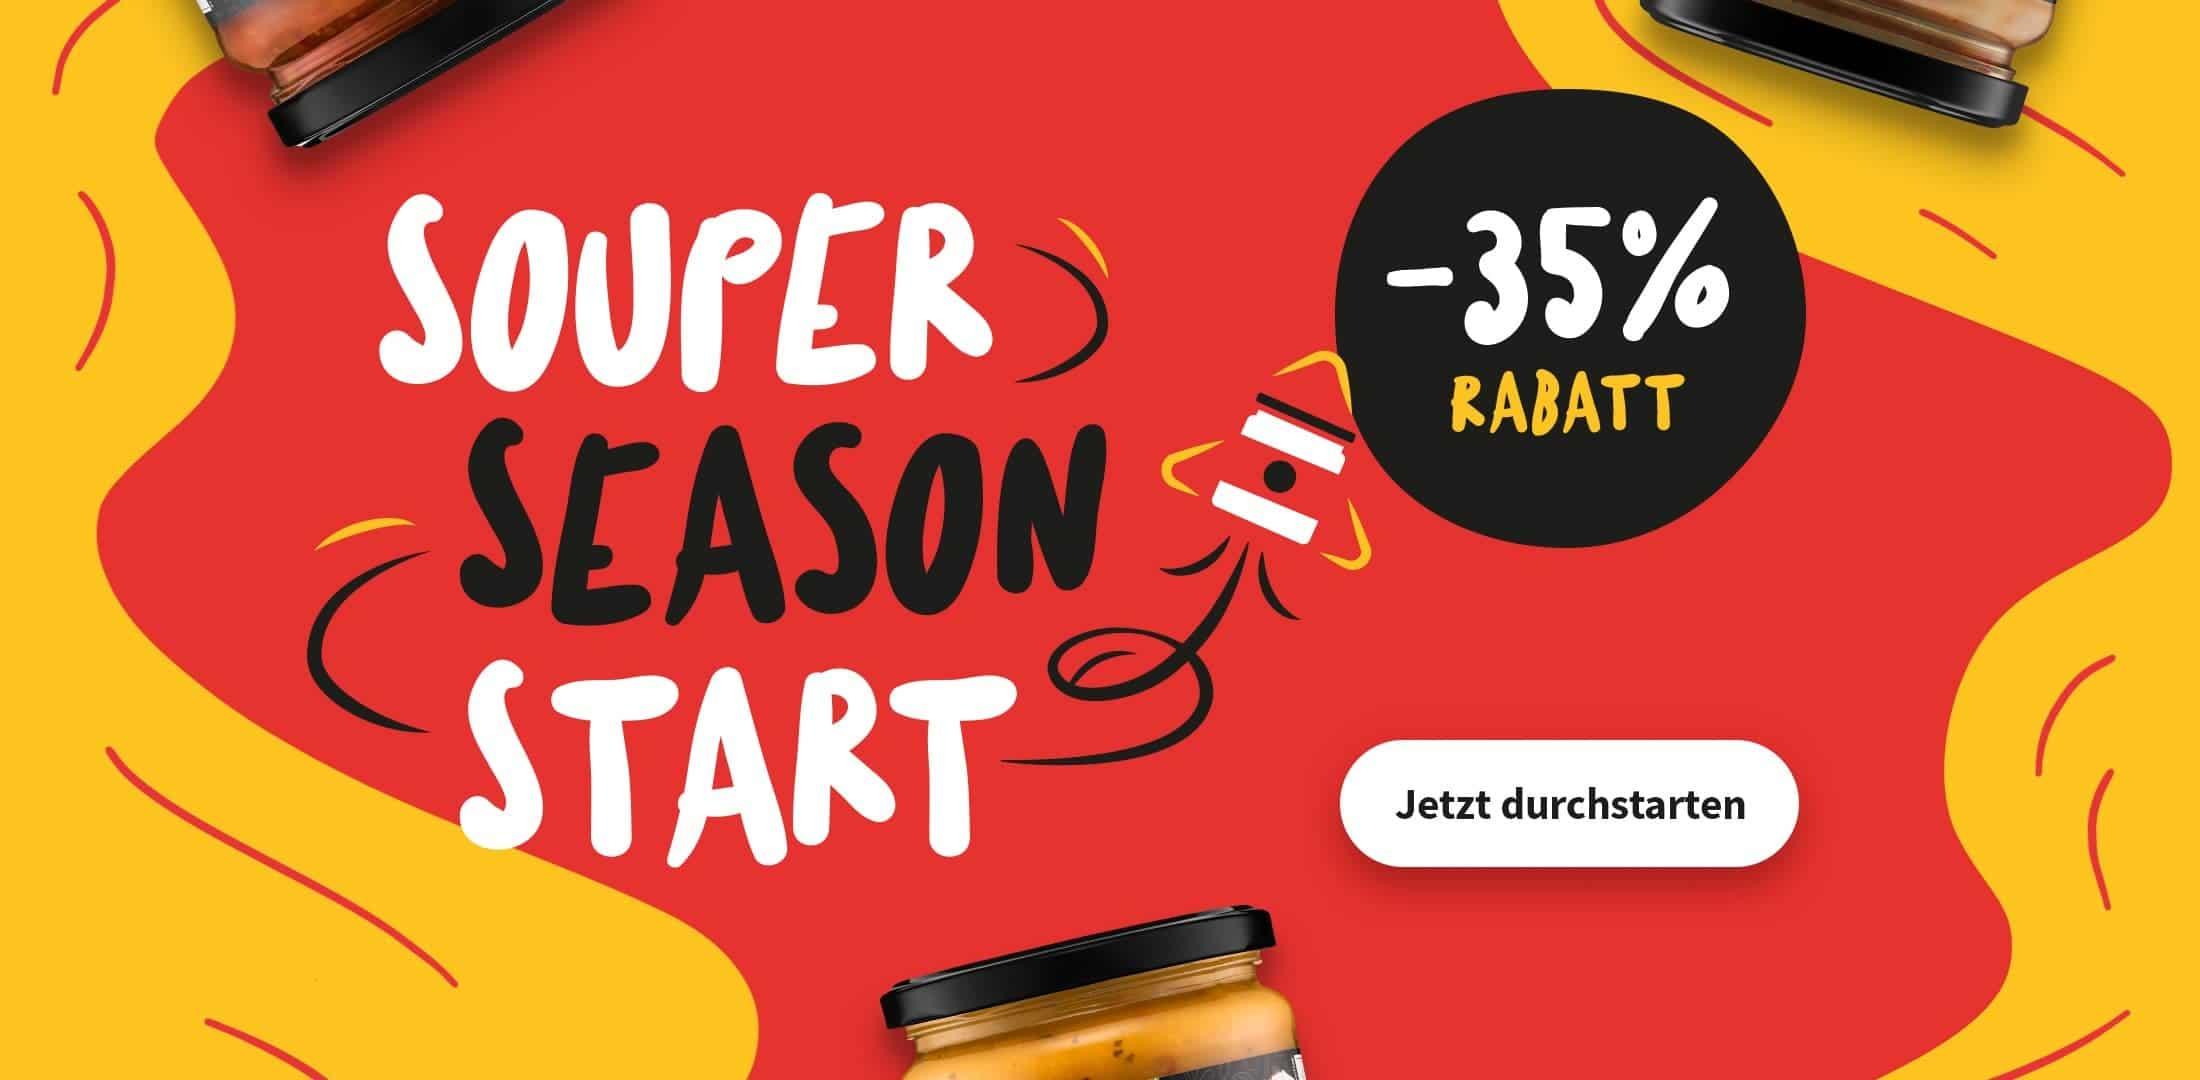 Header Souper Season Start 2021